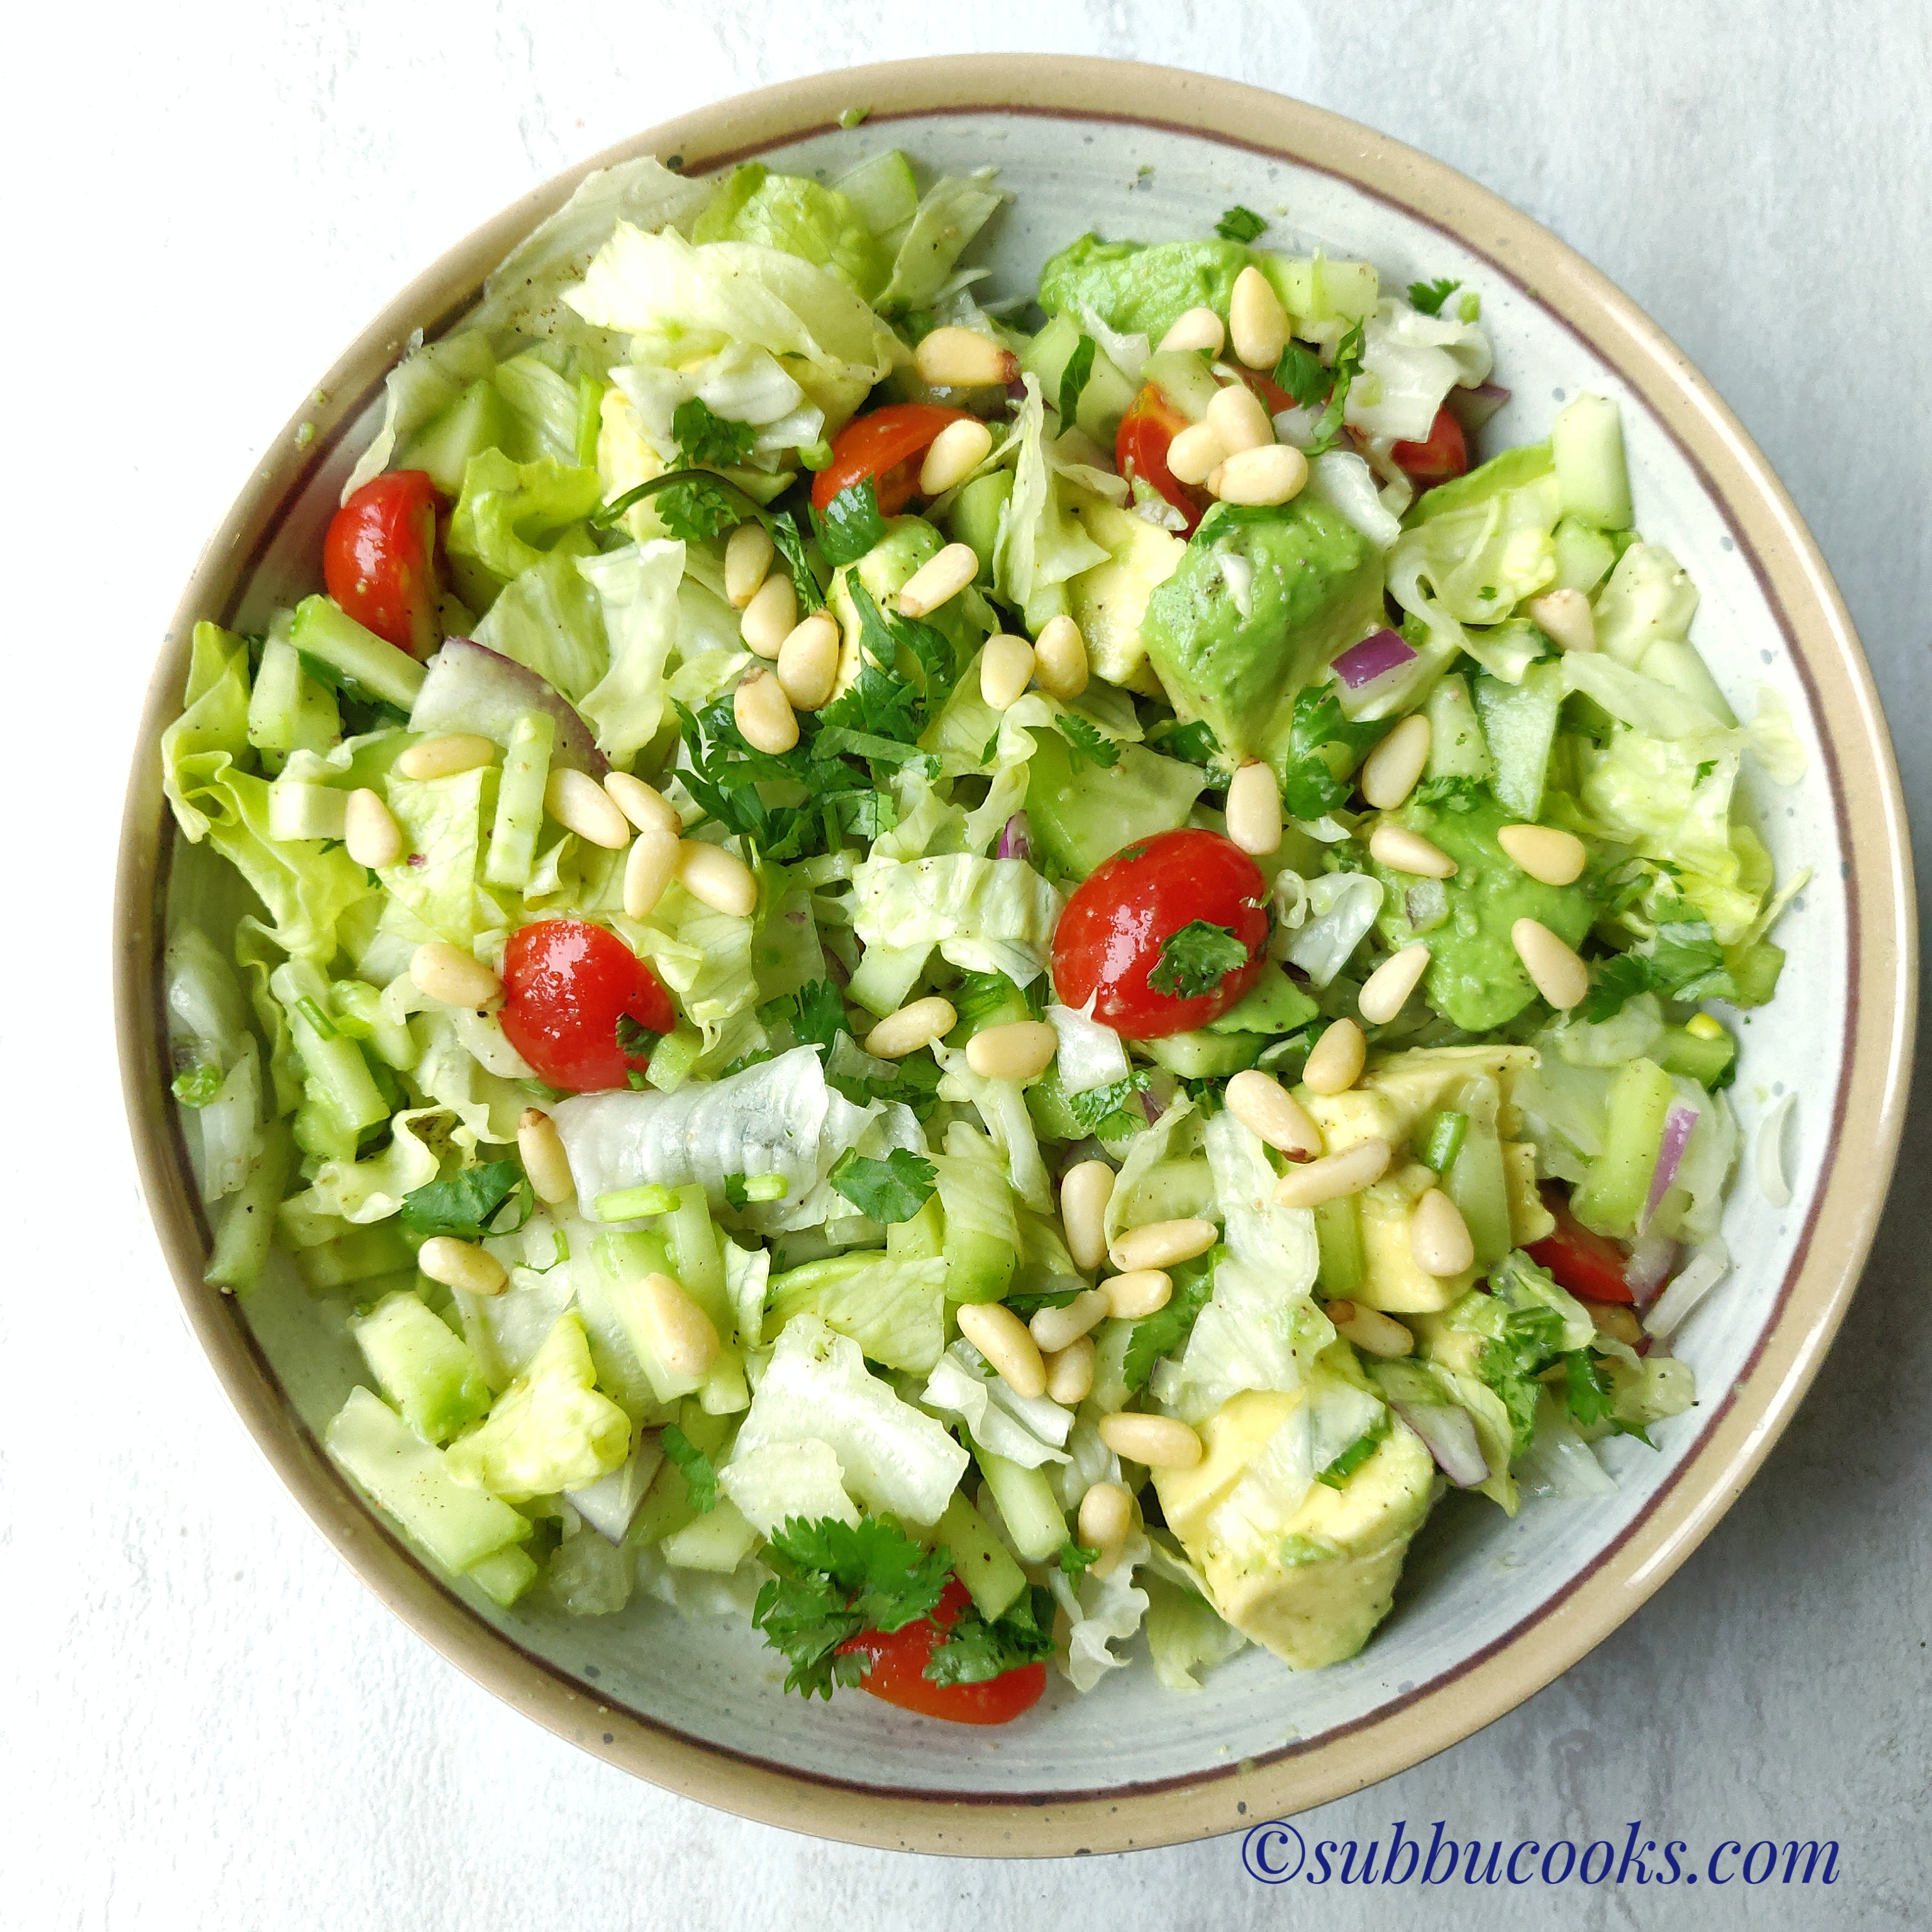 Keto Low Carb Salad Healthy Weightloss Salad Subbu Cooks